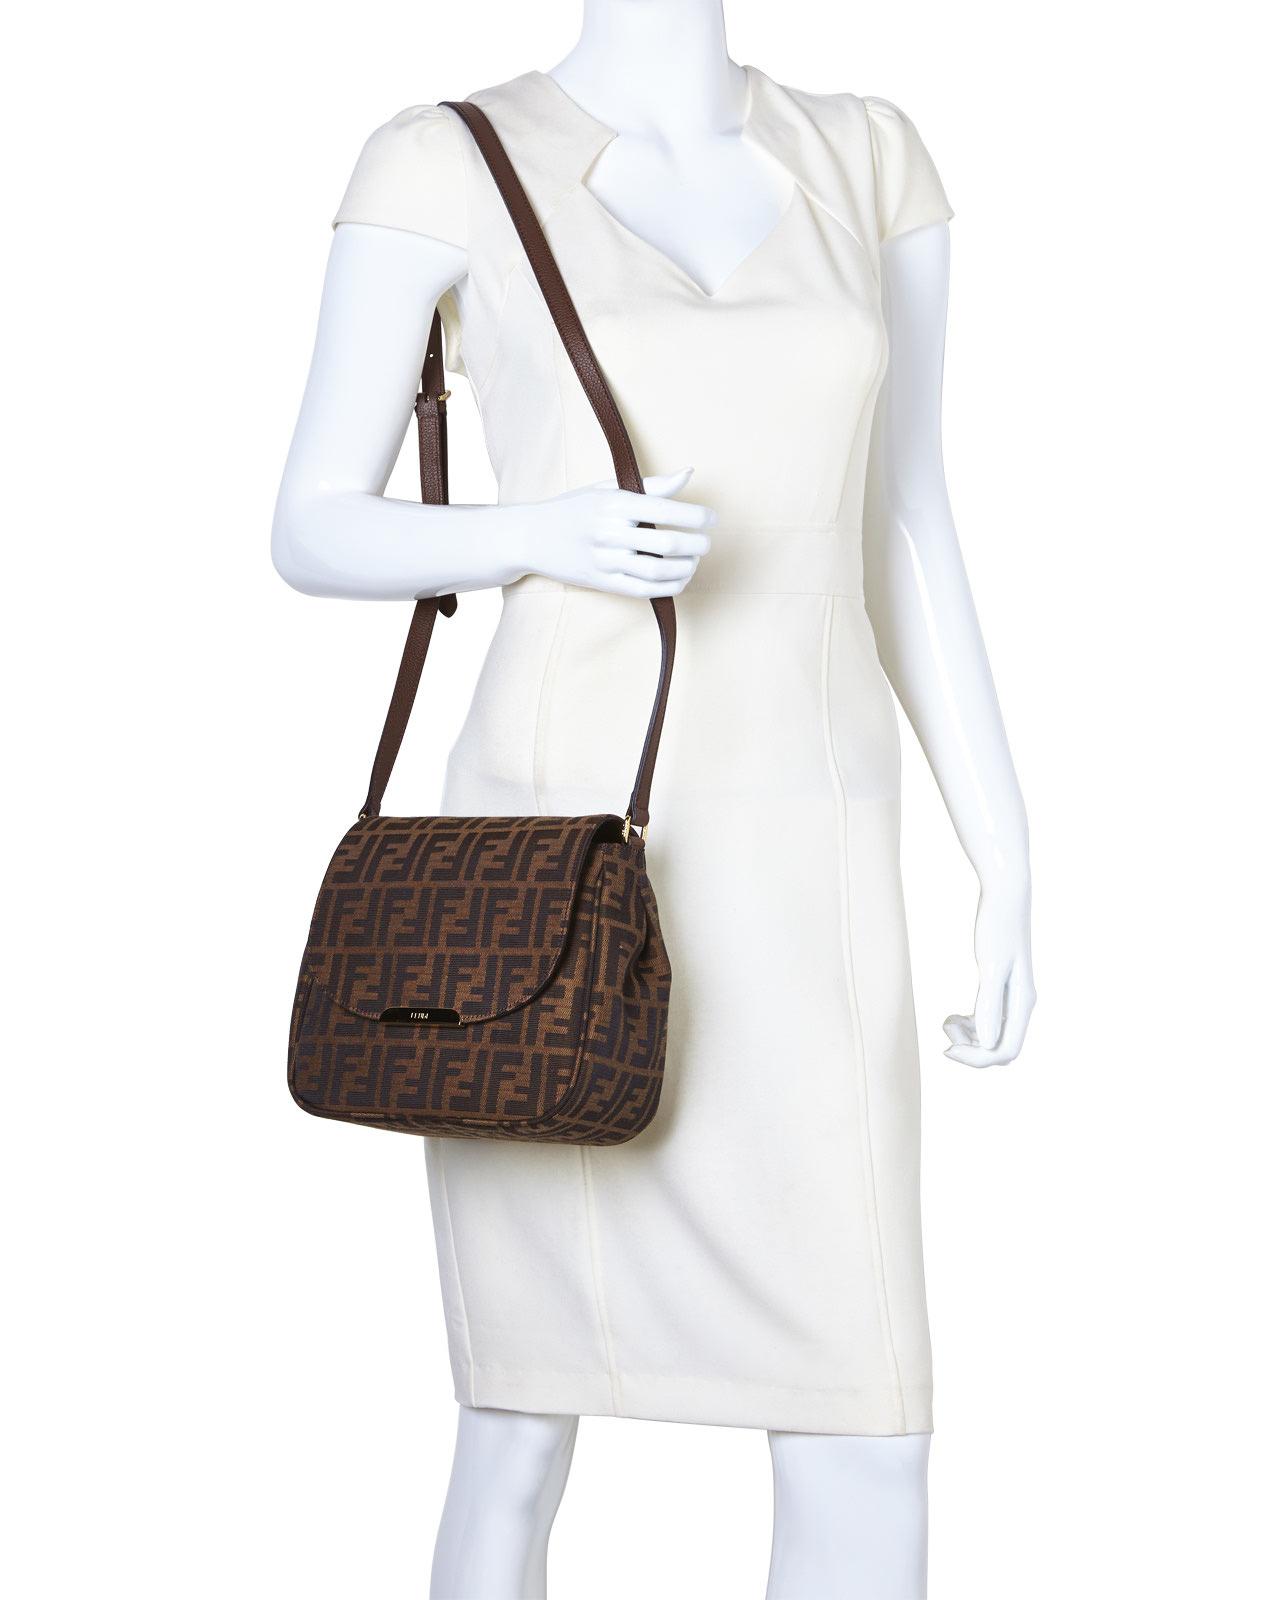 cac44a4eda ... purchase lyst fendi zucca crossbody bag in metallic 96387 ed5d6